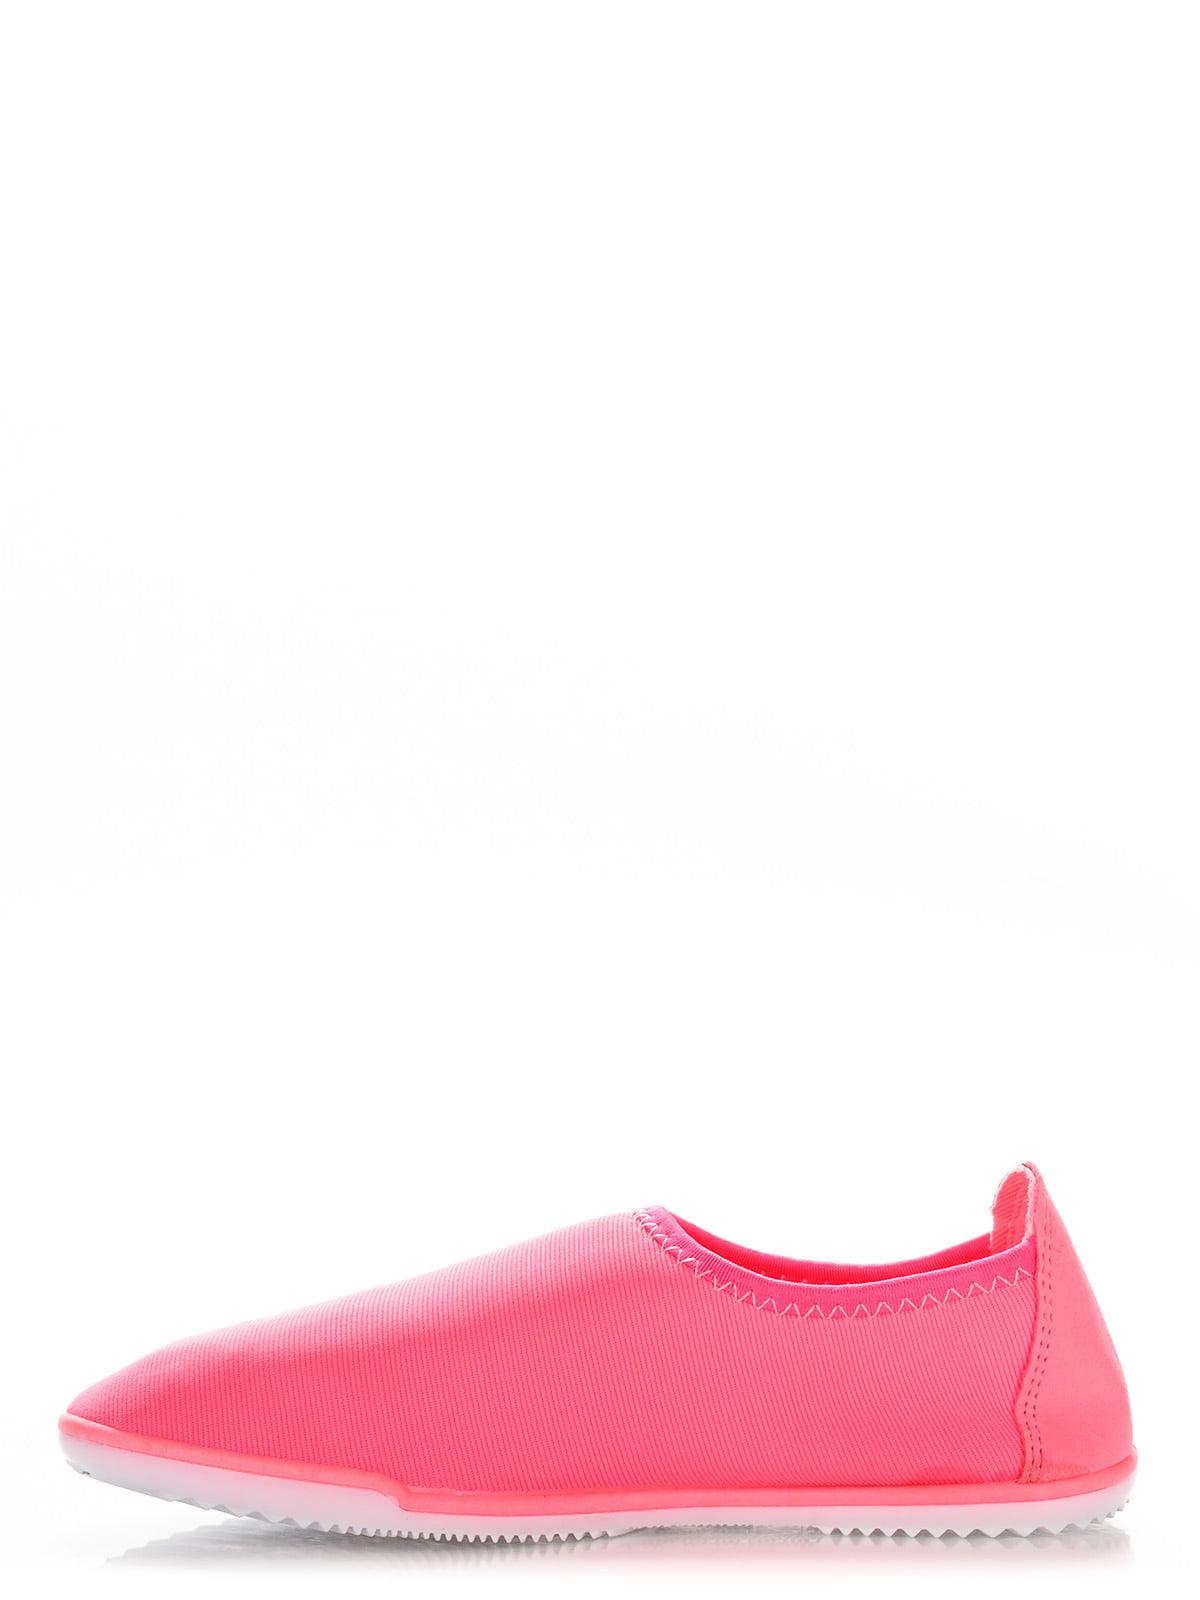 Балетки розовые | 3406385 | фото 3